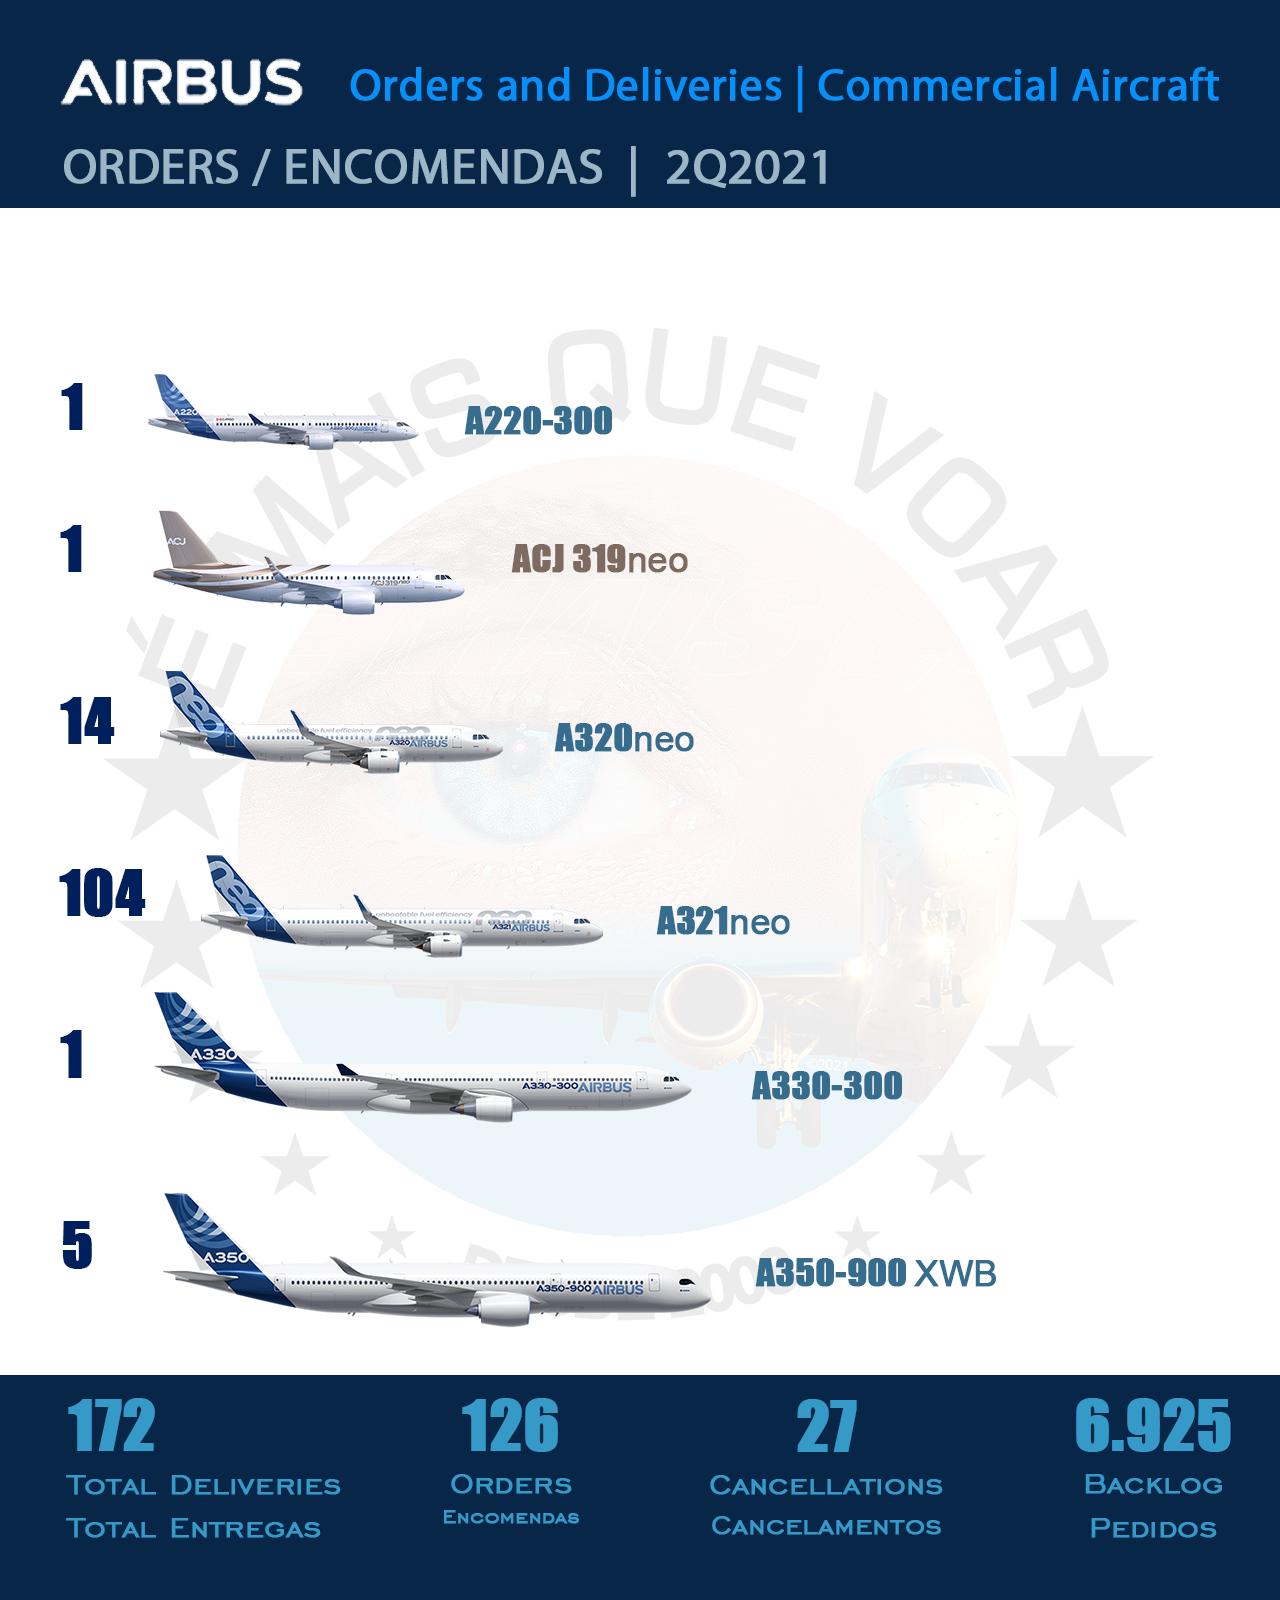 Airbus -  orders in the second quarter of 2021 (2Q21)